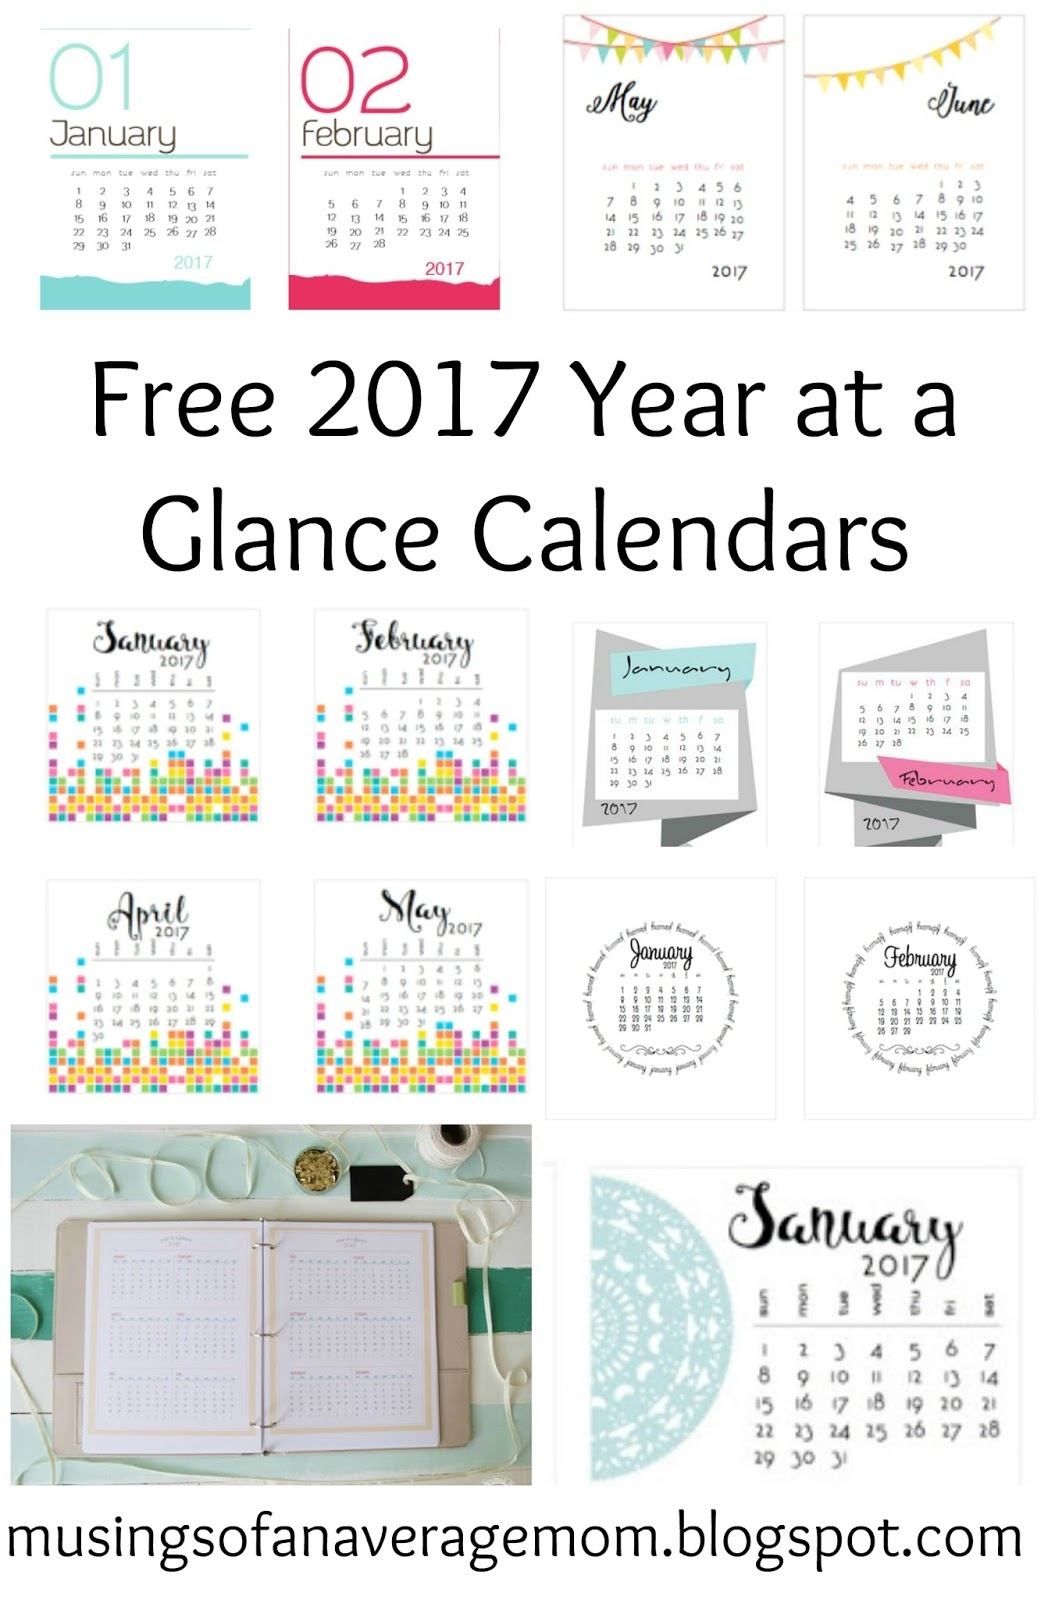 2017 Calendar Printable One Page Calendars Pinterest Free3abry